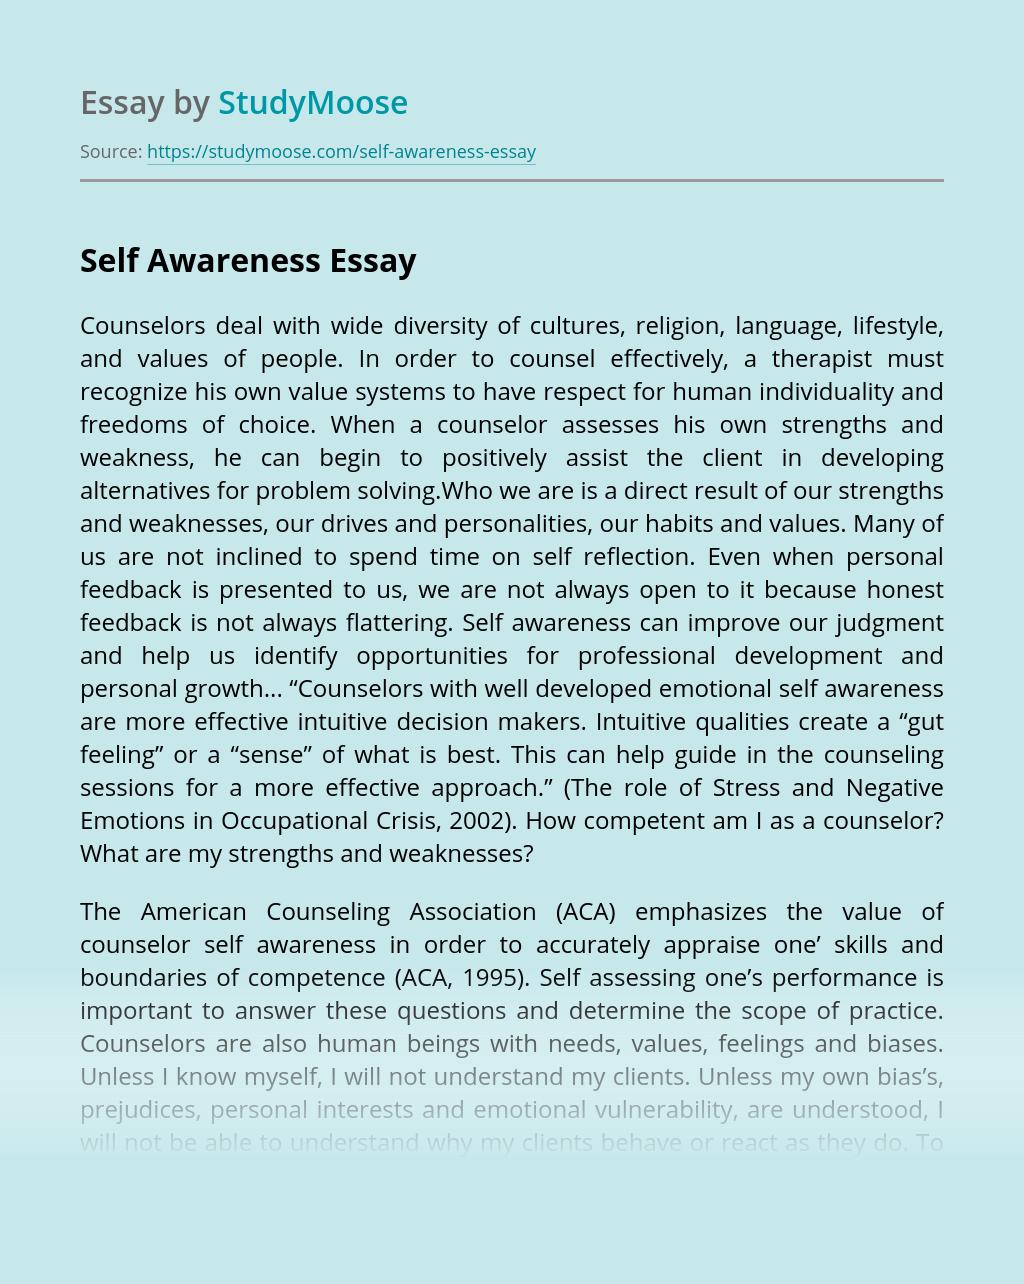 Self Awareness